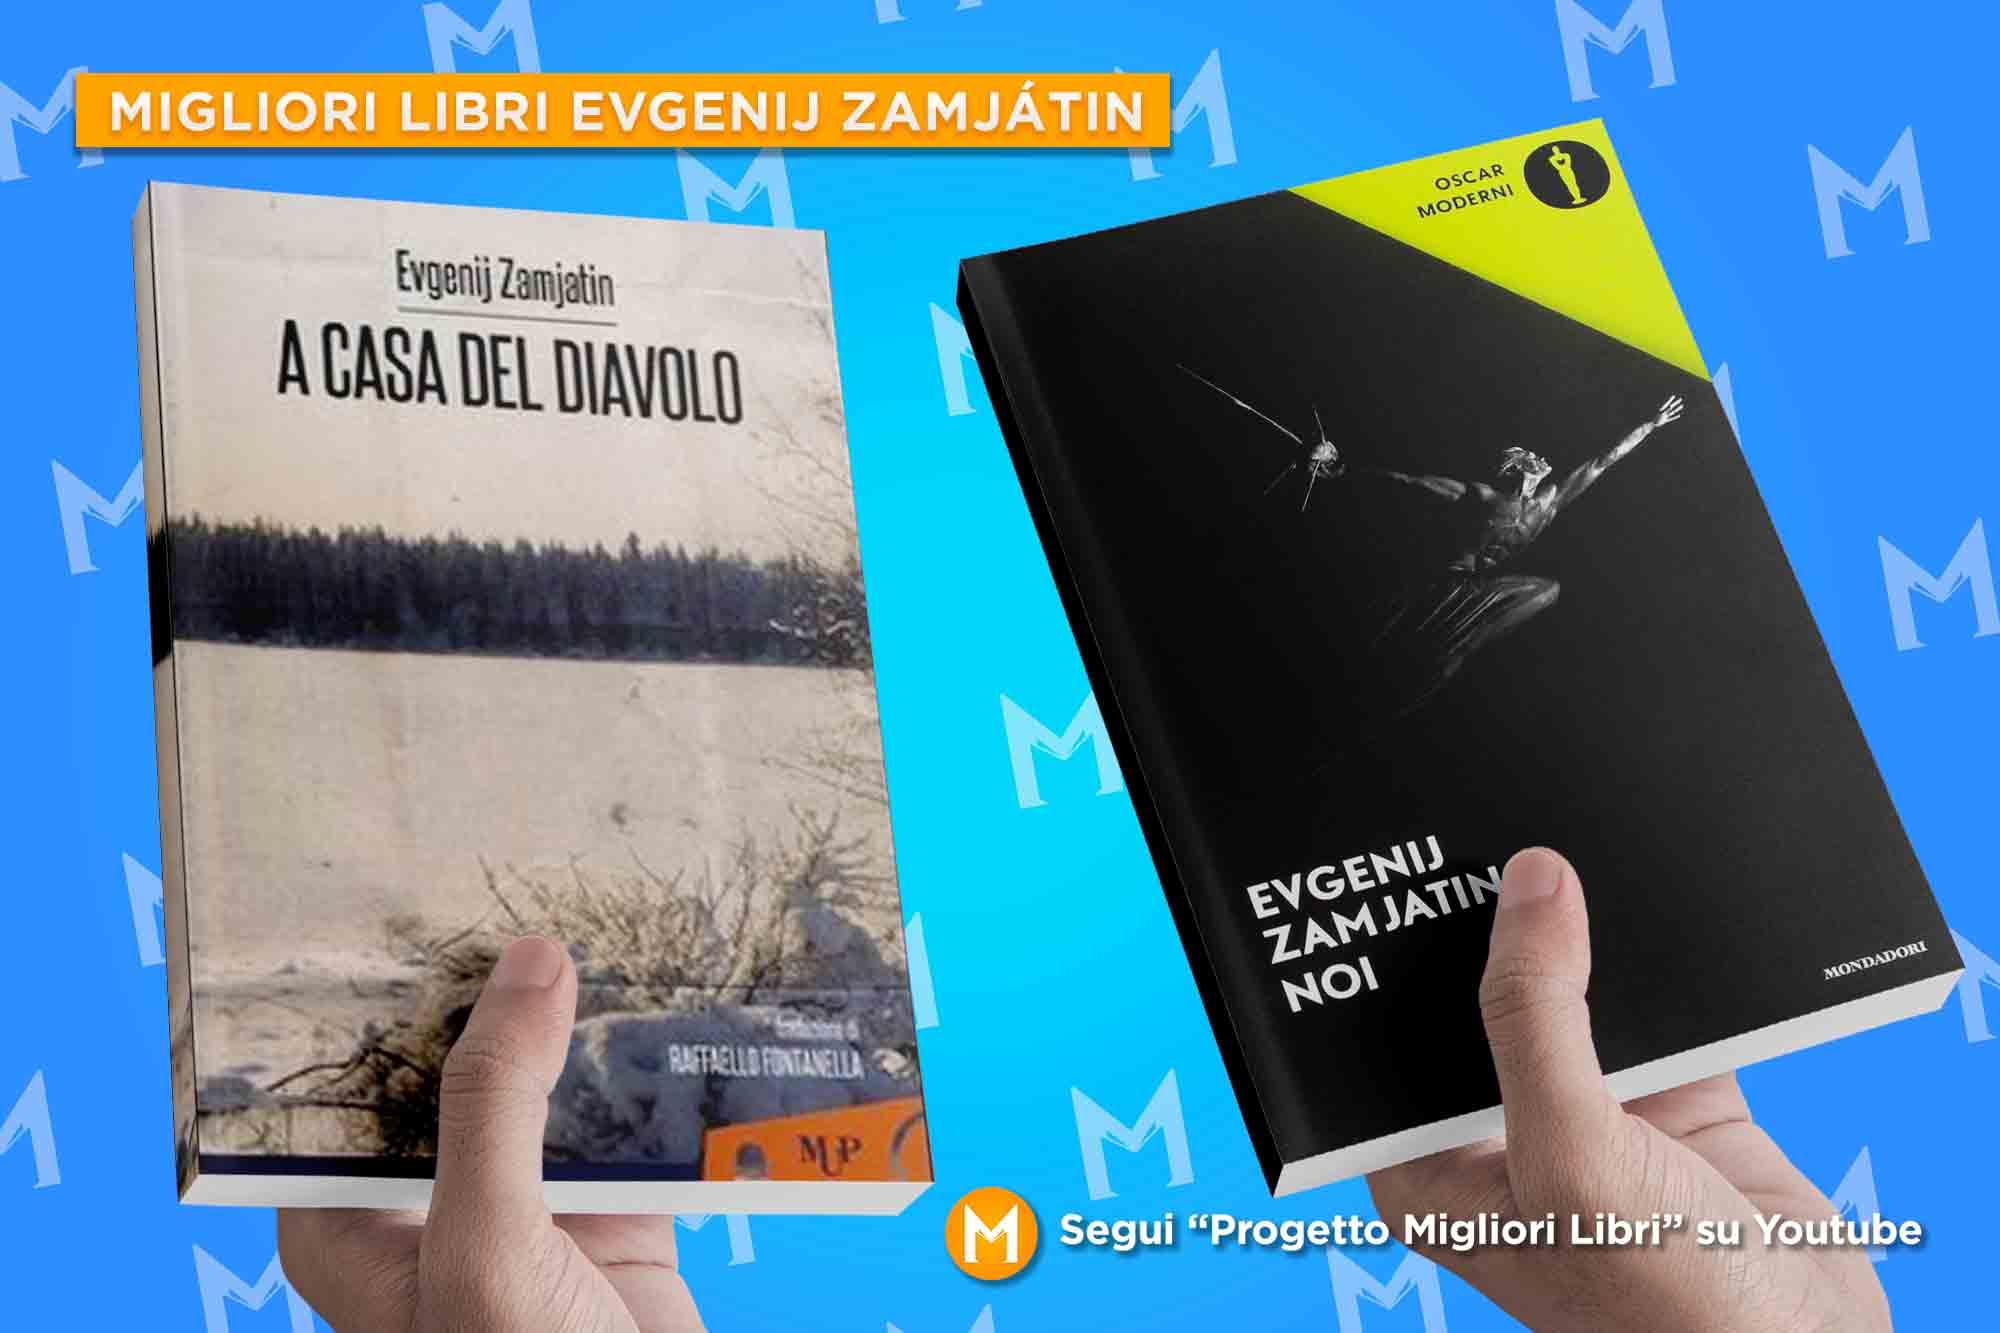 migliori-libri-evgenij-zamjatin